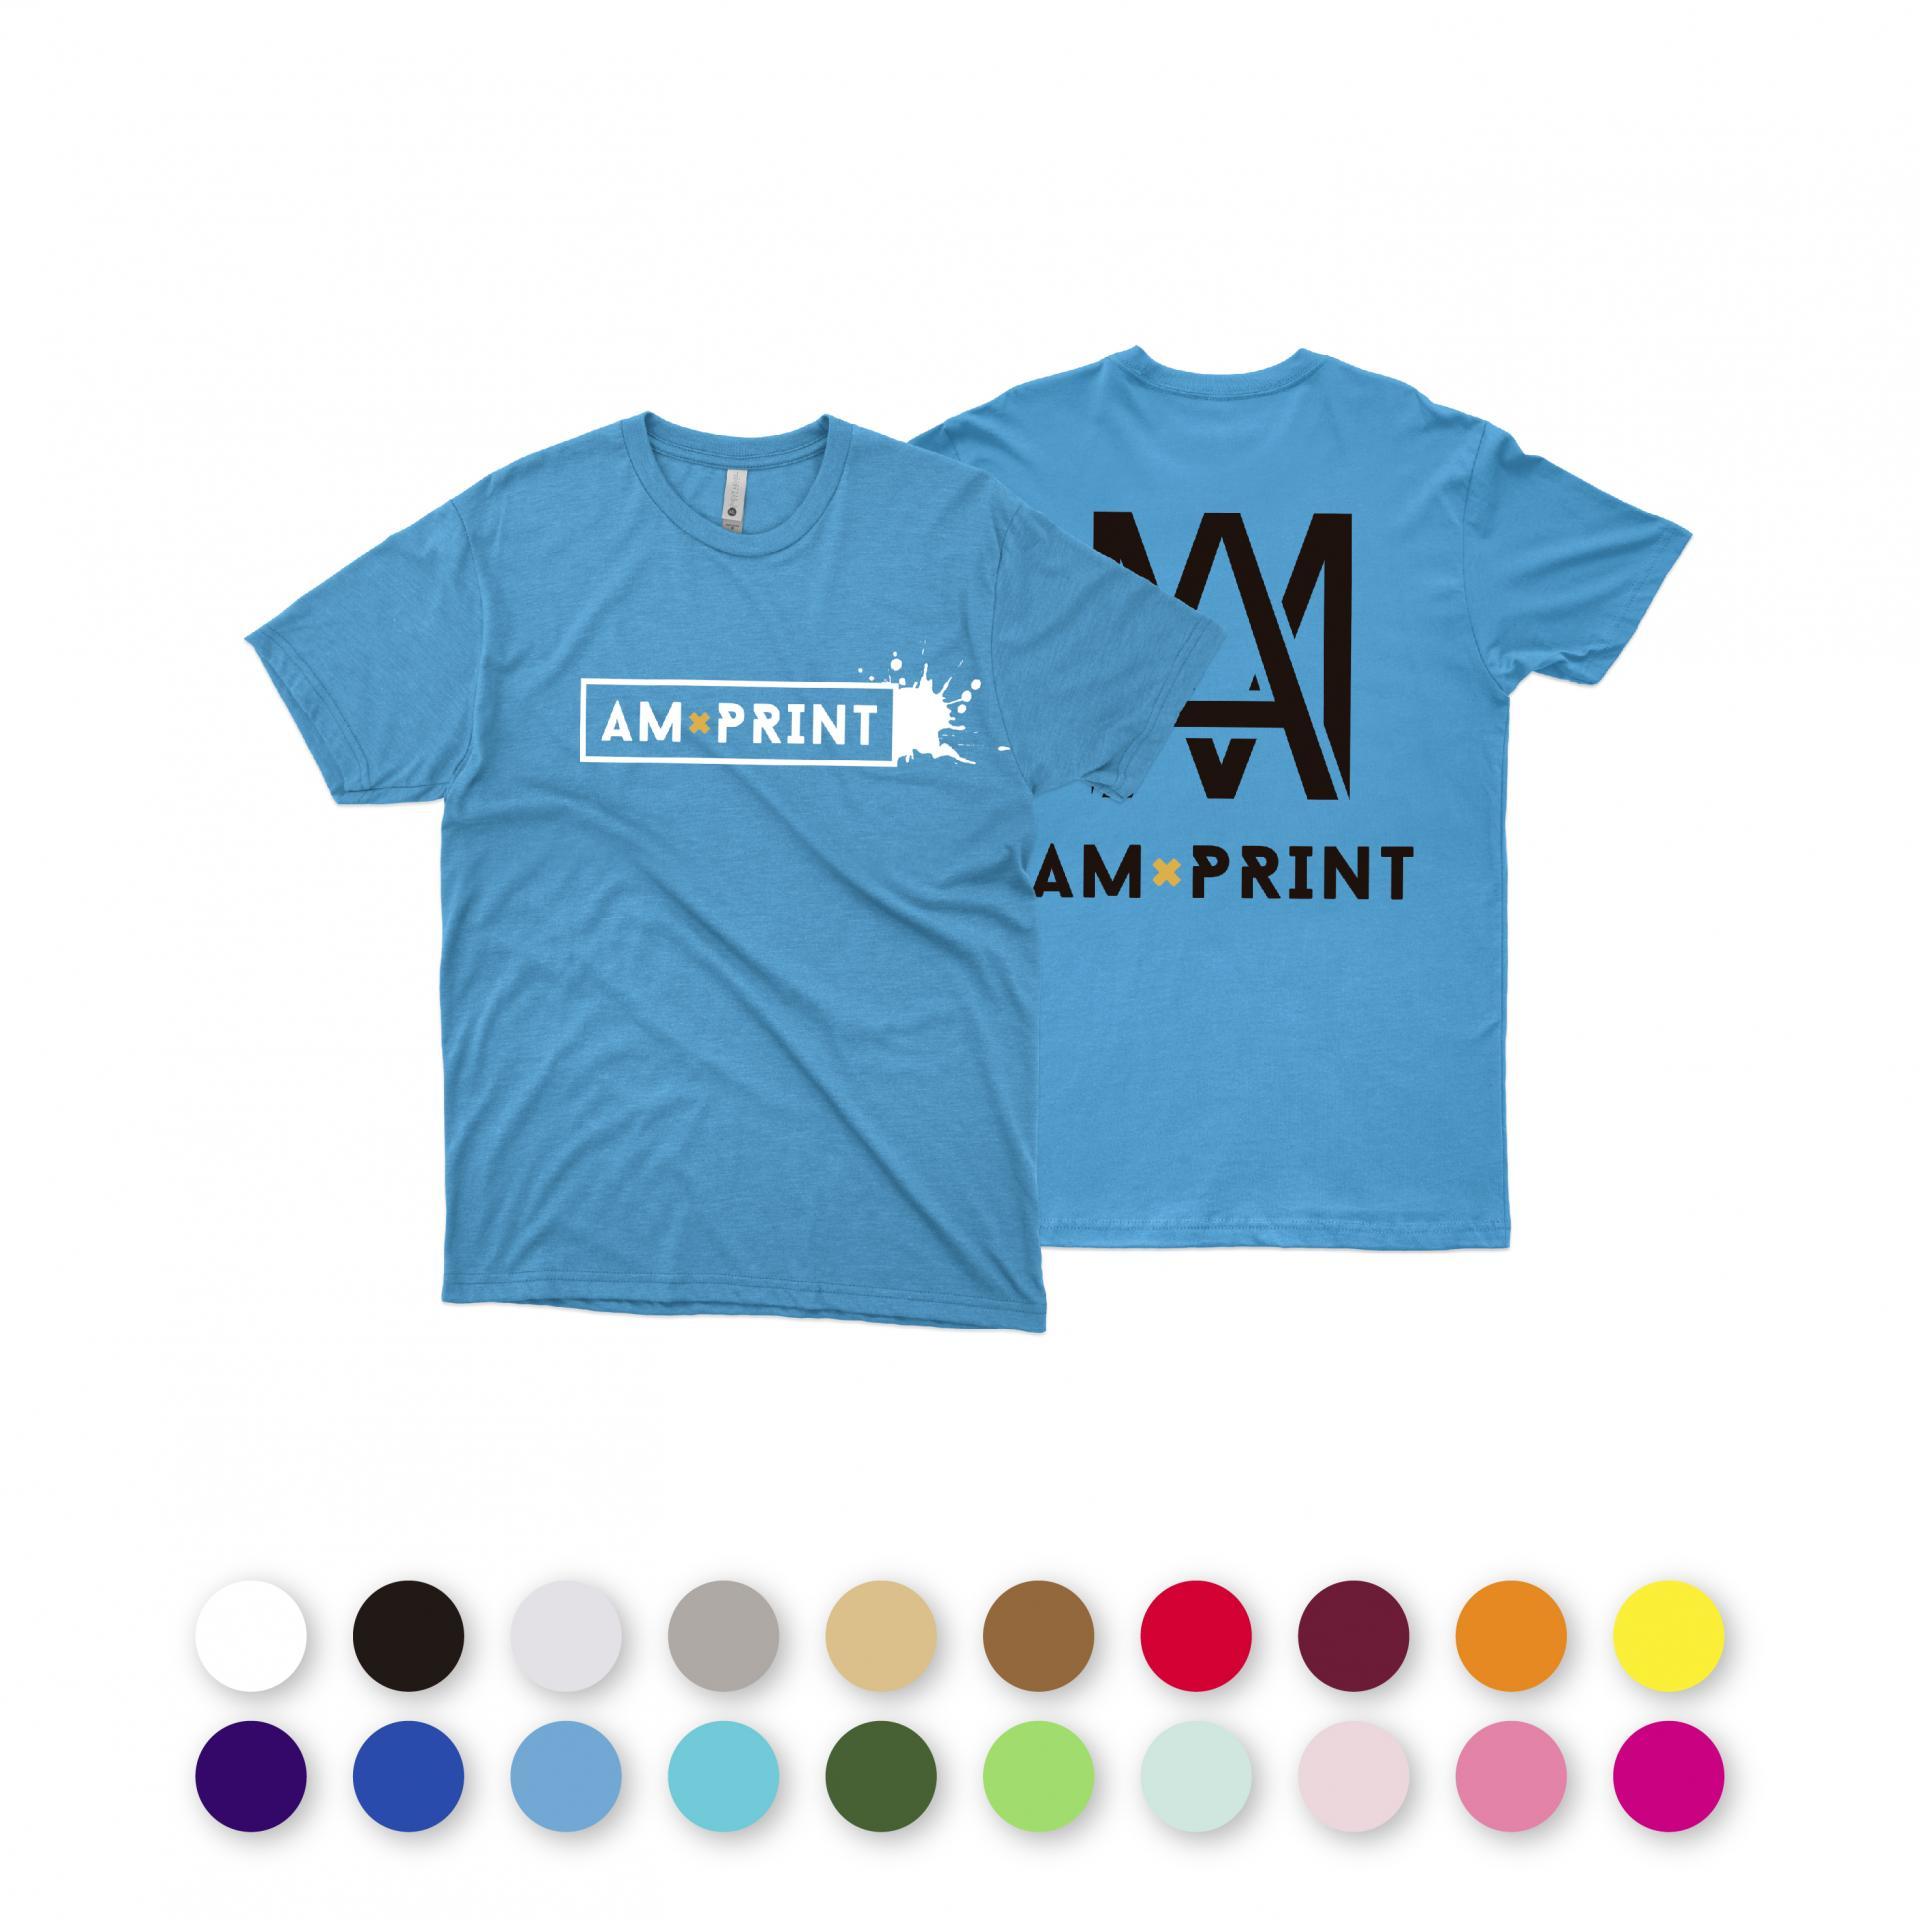 Camiseta Infantil - Pecho y espalda